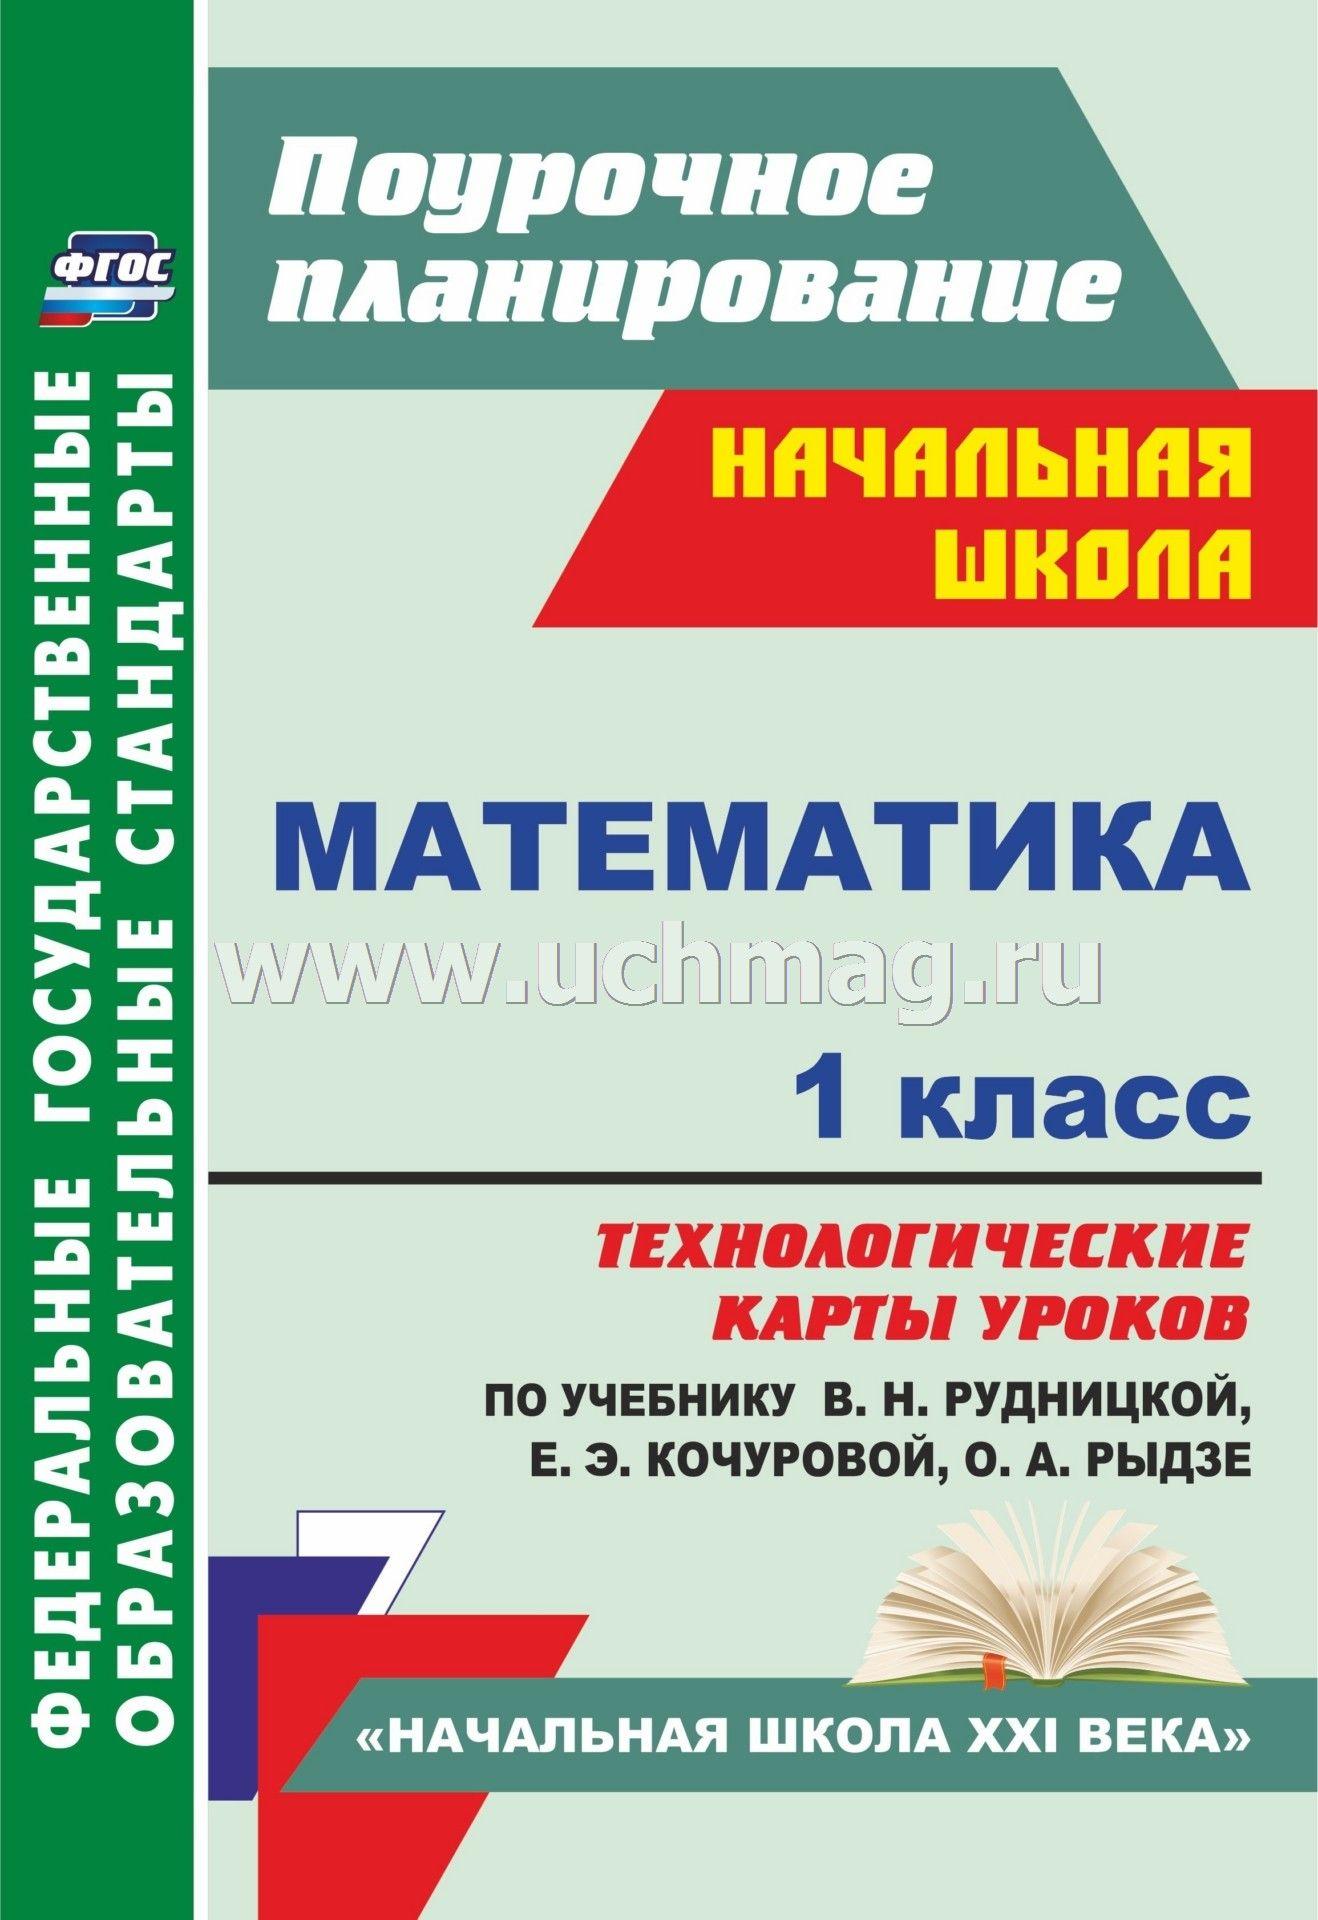 Математика школа 21 век рудницкая 1 класс стр 116 урок 52 фгос